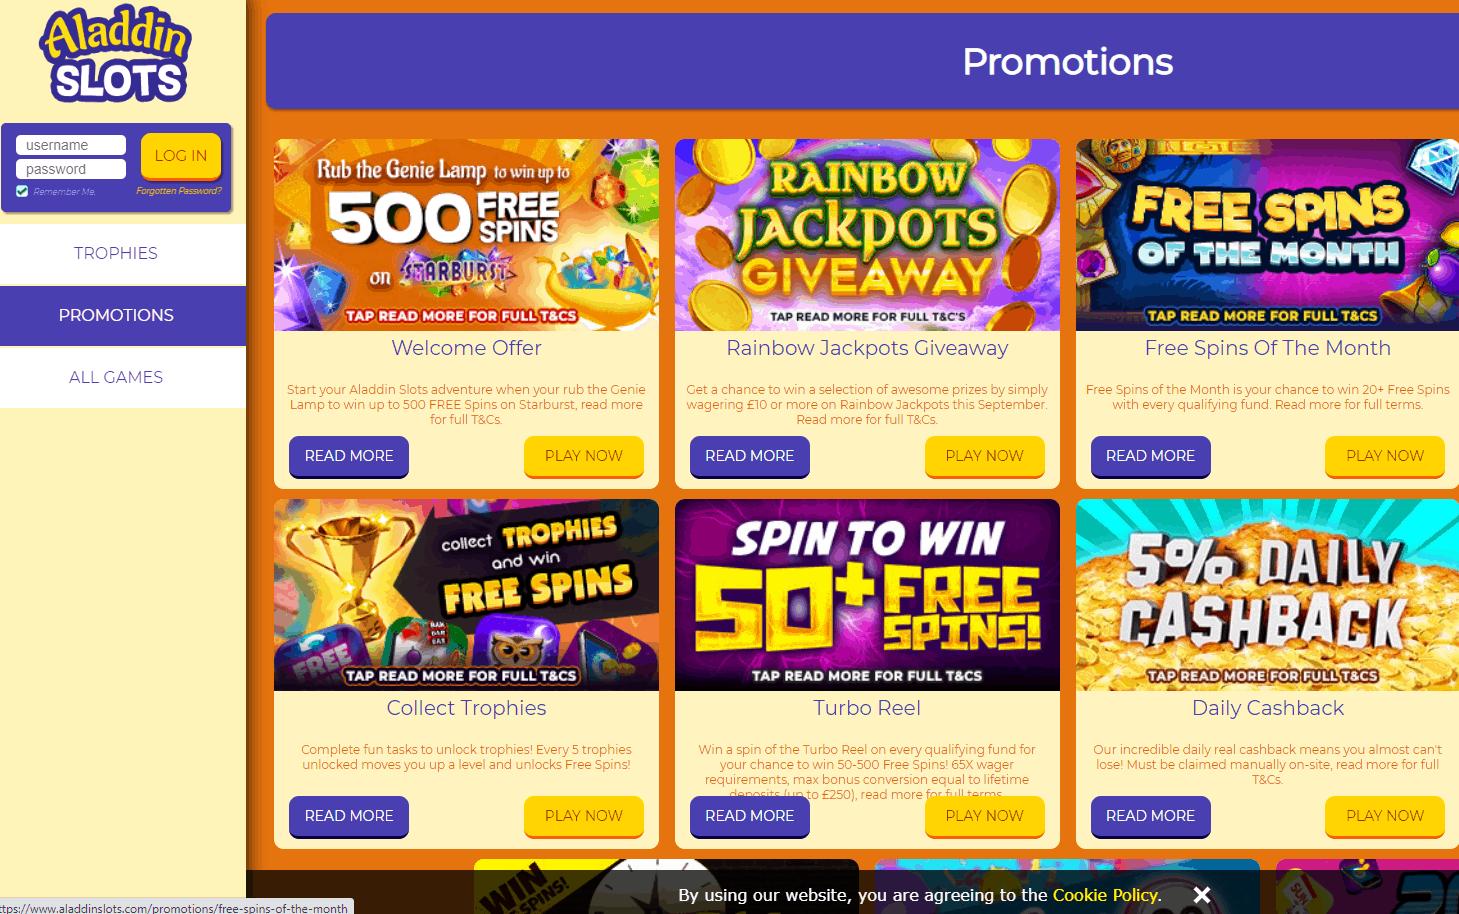 aladdin slots promotions